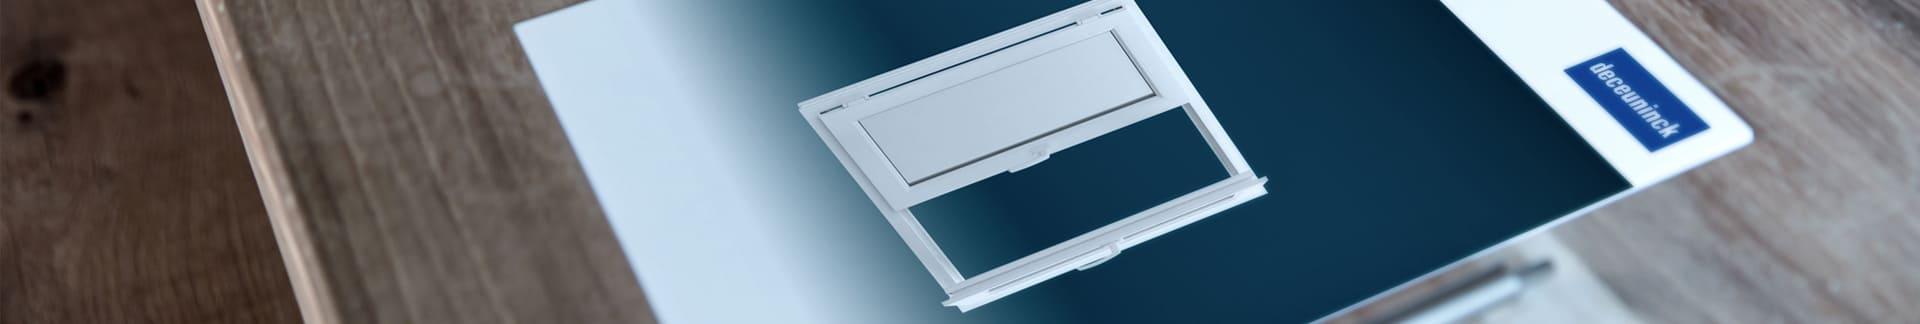 janela-de-abertura-dupla